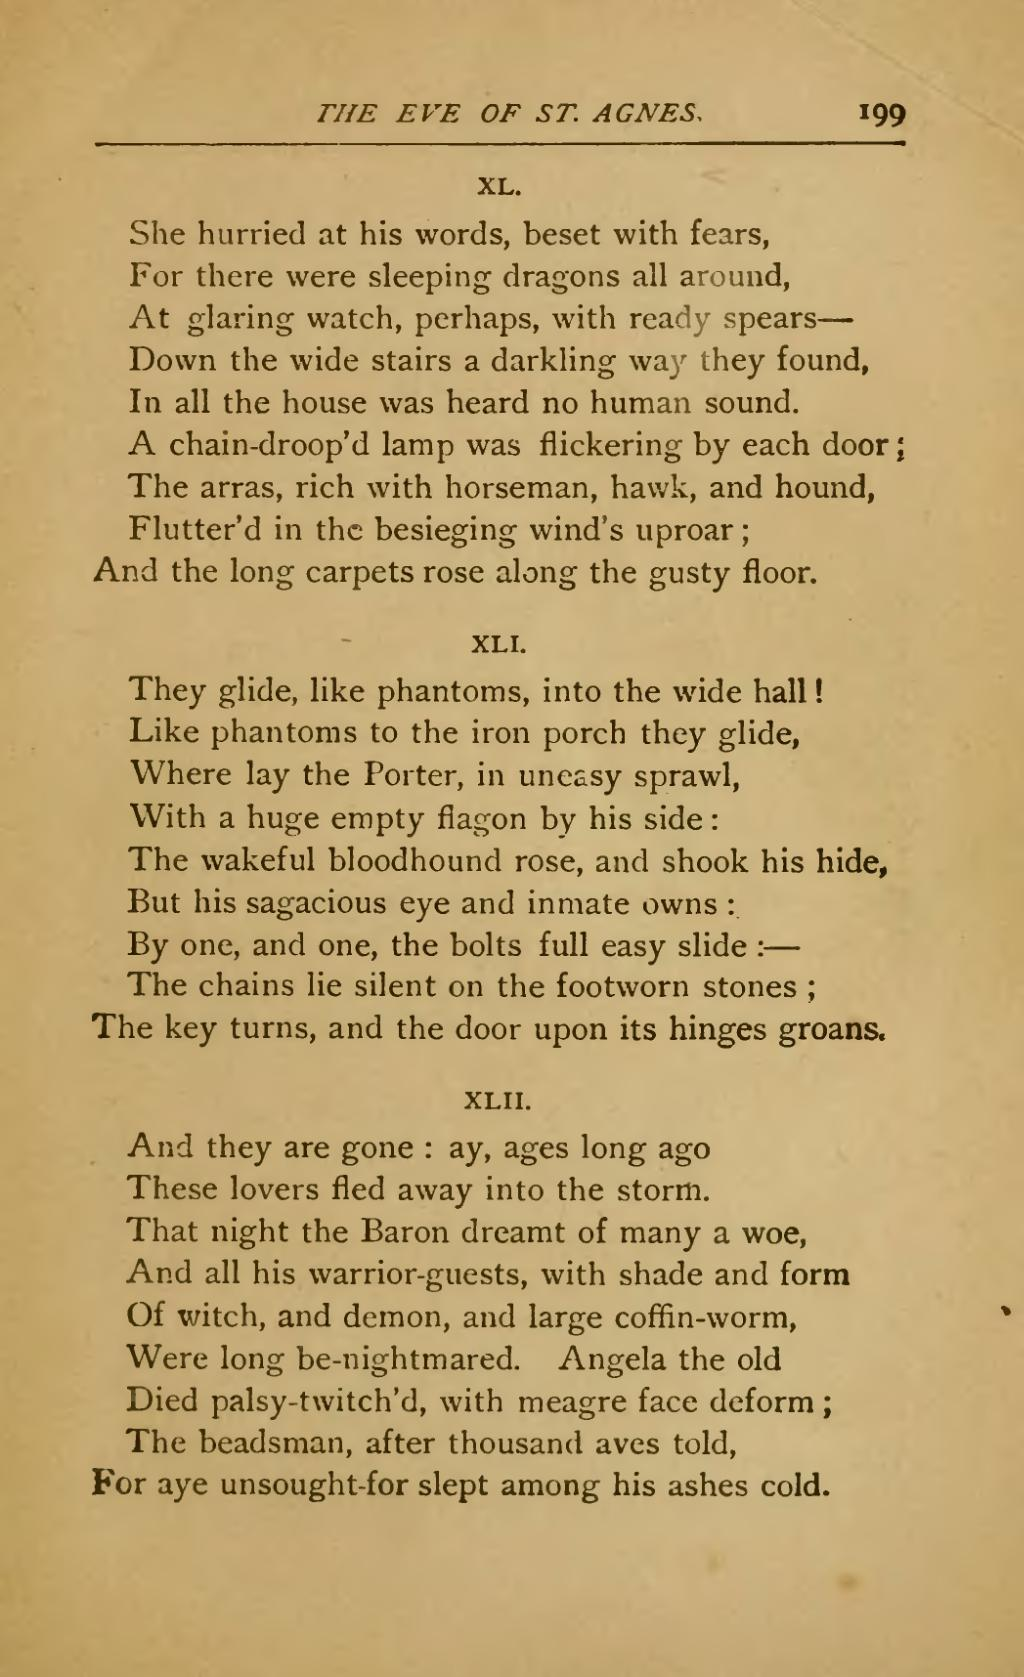 Angela Baron page:keats - poetical works, dewolfe, 1884.djvu/213